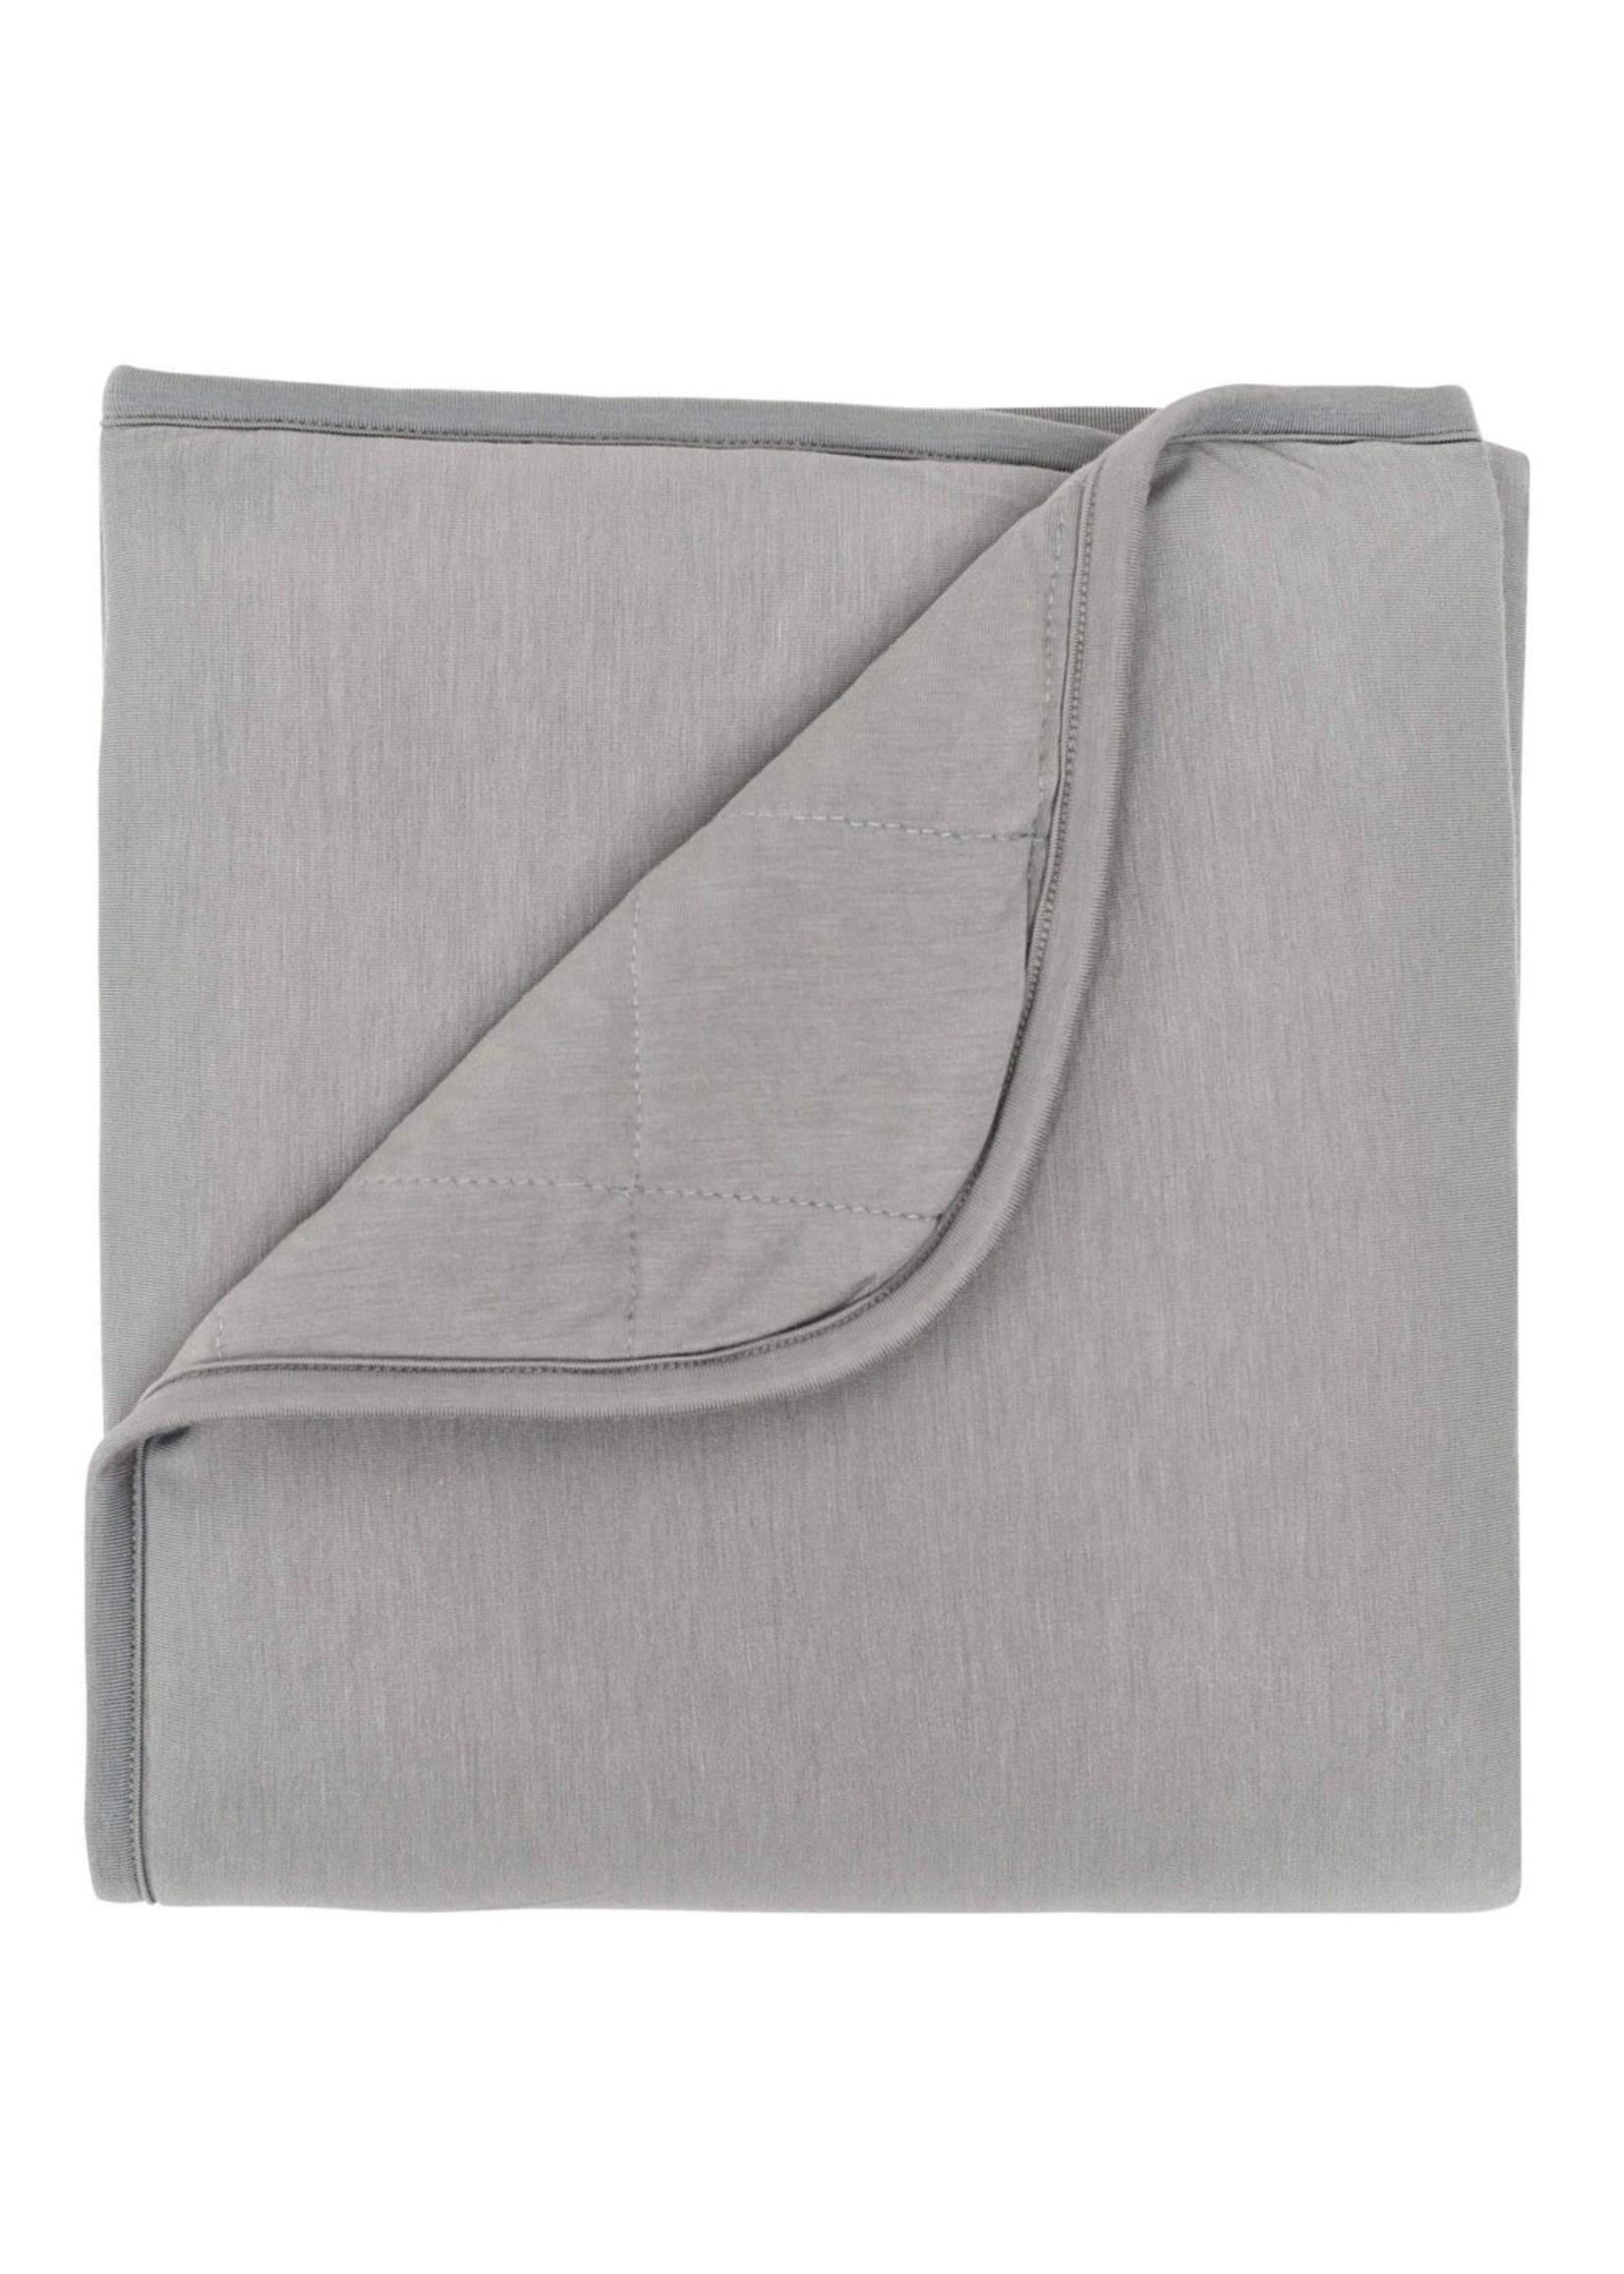 KYTE BABY Baby Blanket CHROME